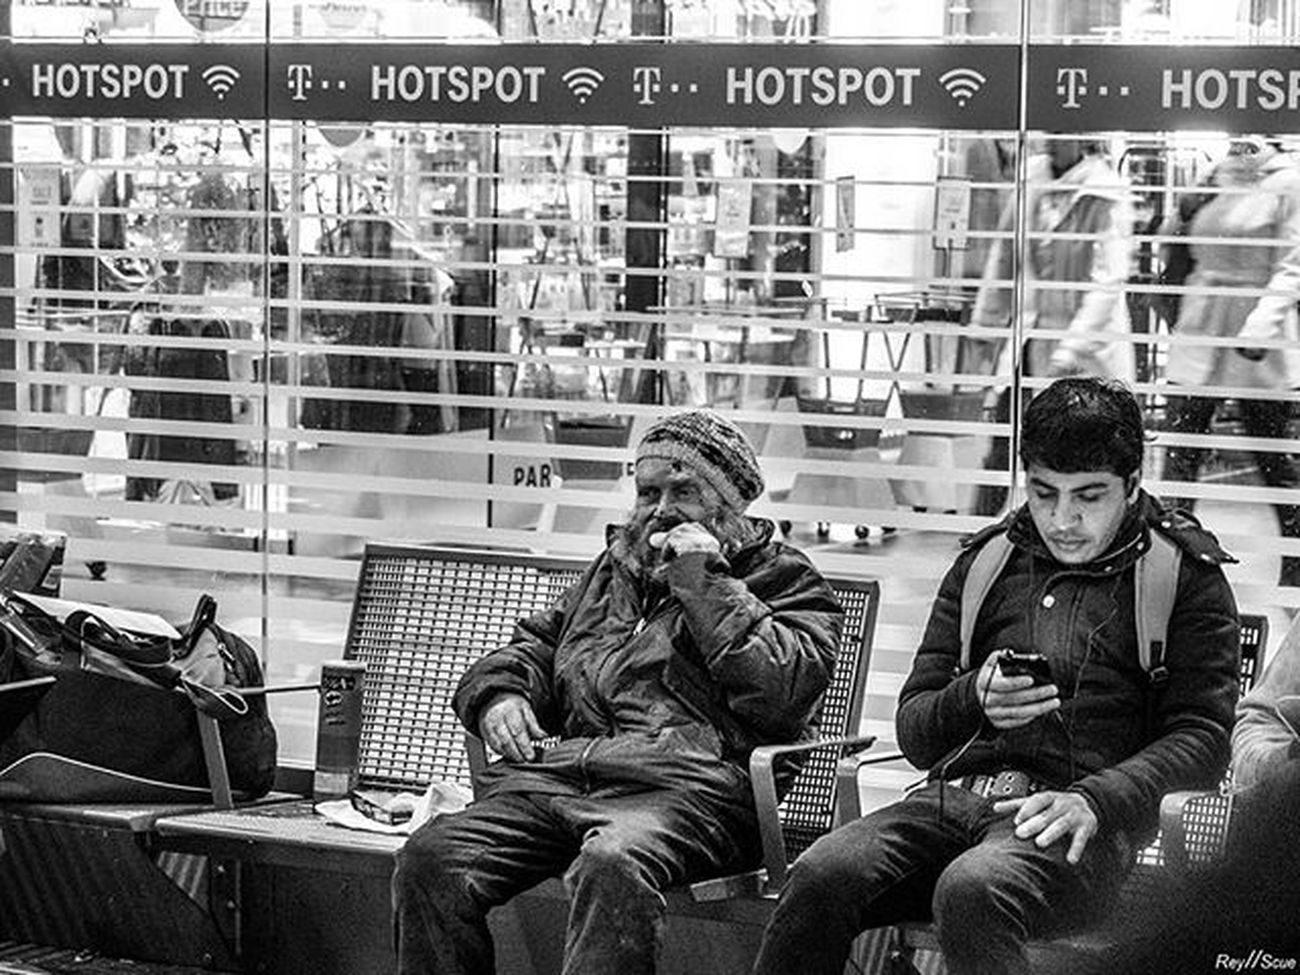 HotSpot Reyscue Street Moments Frankfurt Germany Outdoor Bw Urban Social Documentary Homeless People Olympus Mft Pictureoftheday Picoftheday Bestoftheday Instagood Photoof Bw_street White Black Blackandwhite Streetphotography Sadness 1 2 3